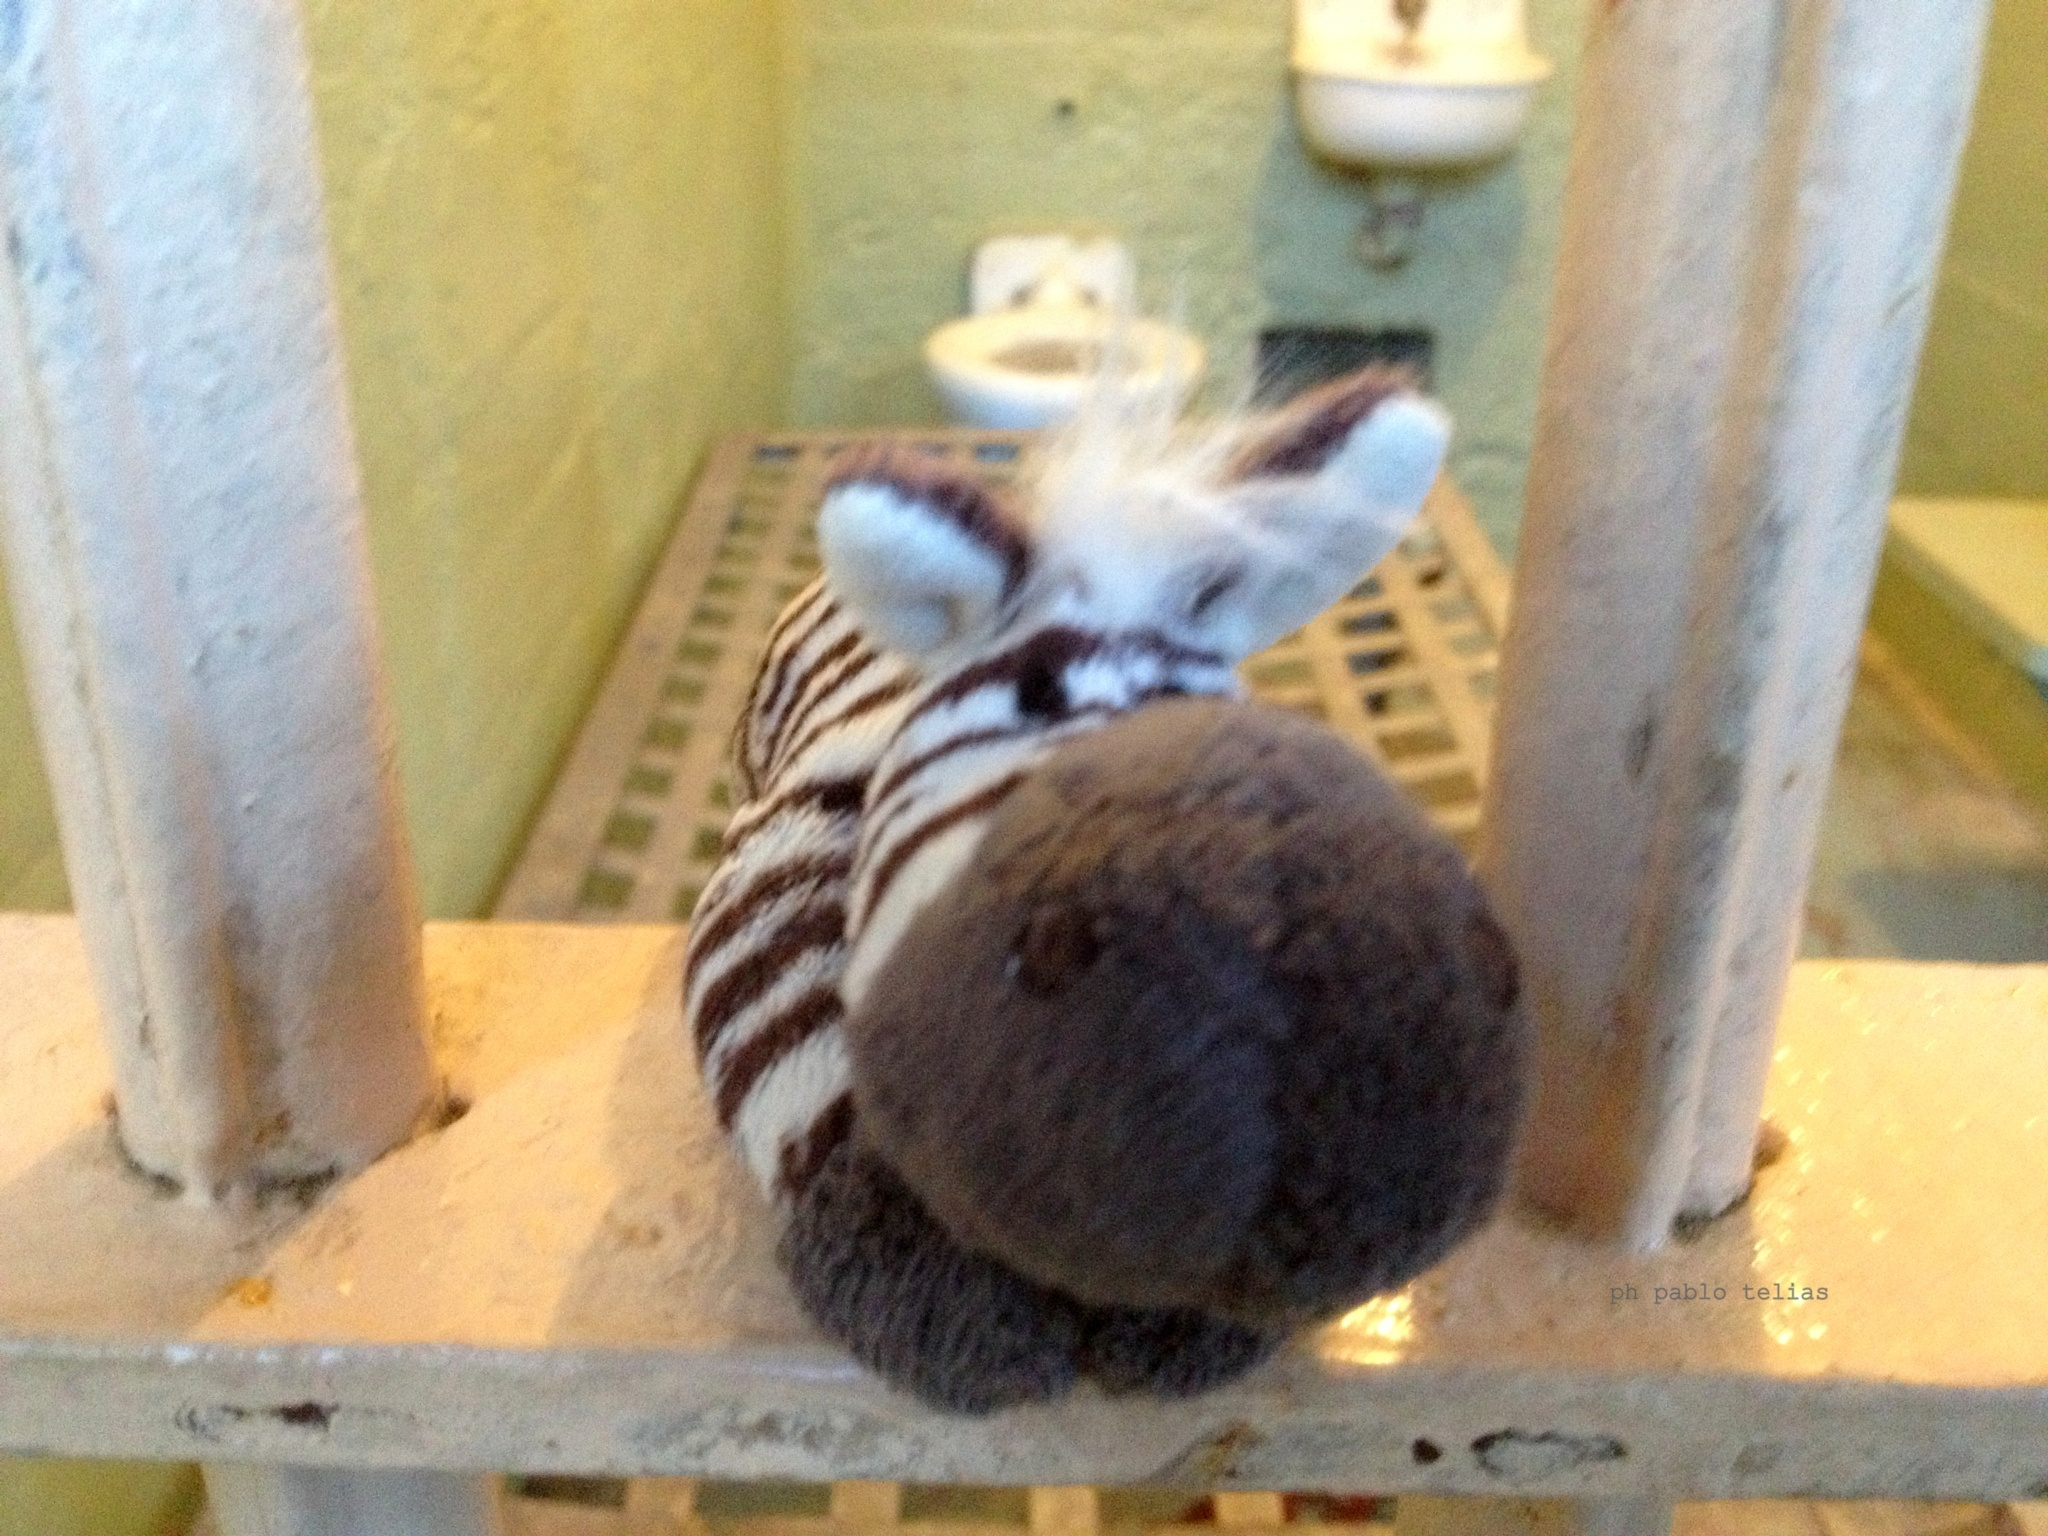 Zebri  arrested in alcatraz by PabloT